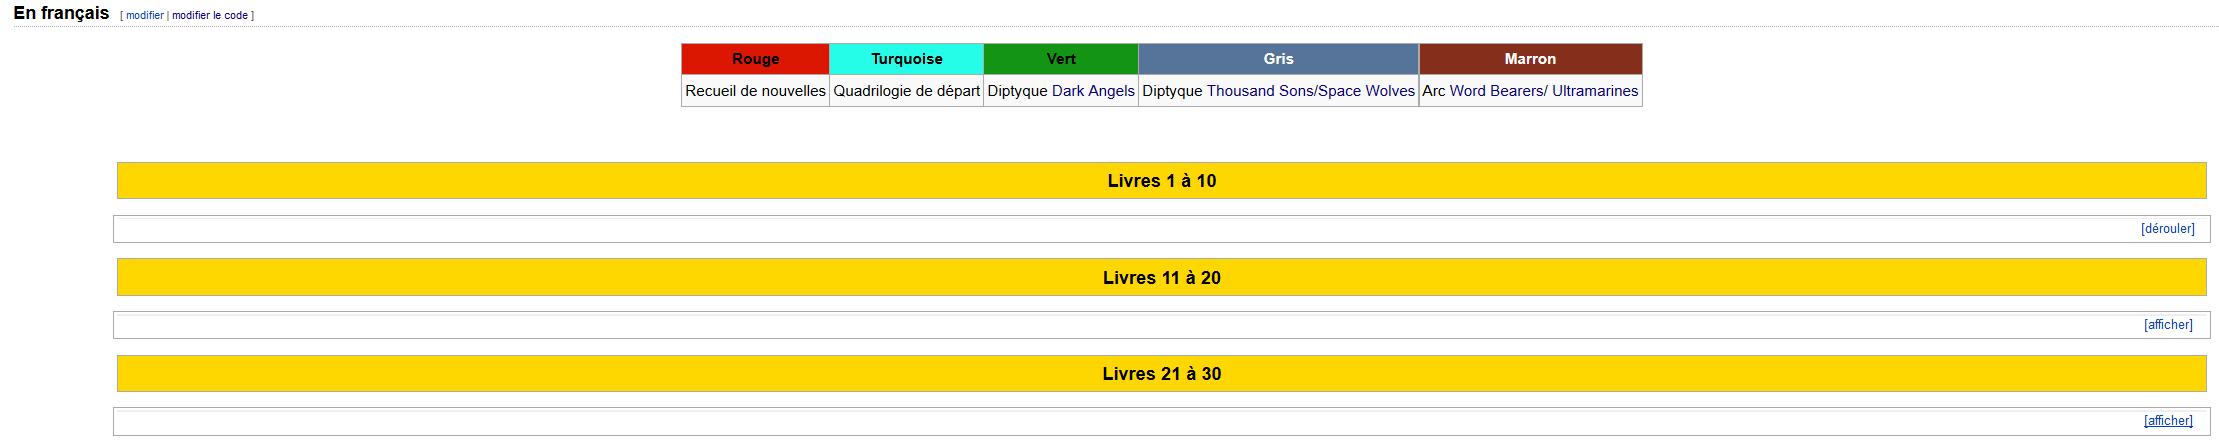 Page Wikipédia Hérésie Horus 259390wiki